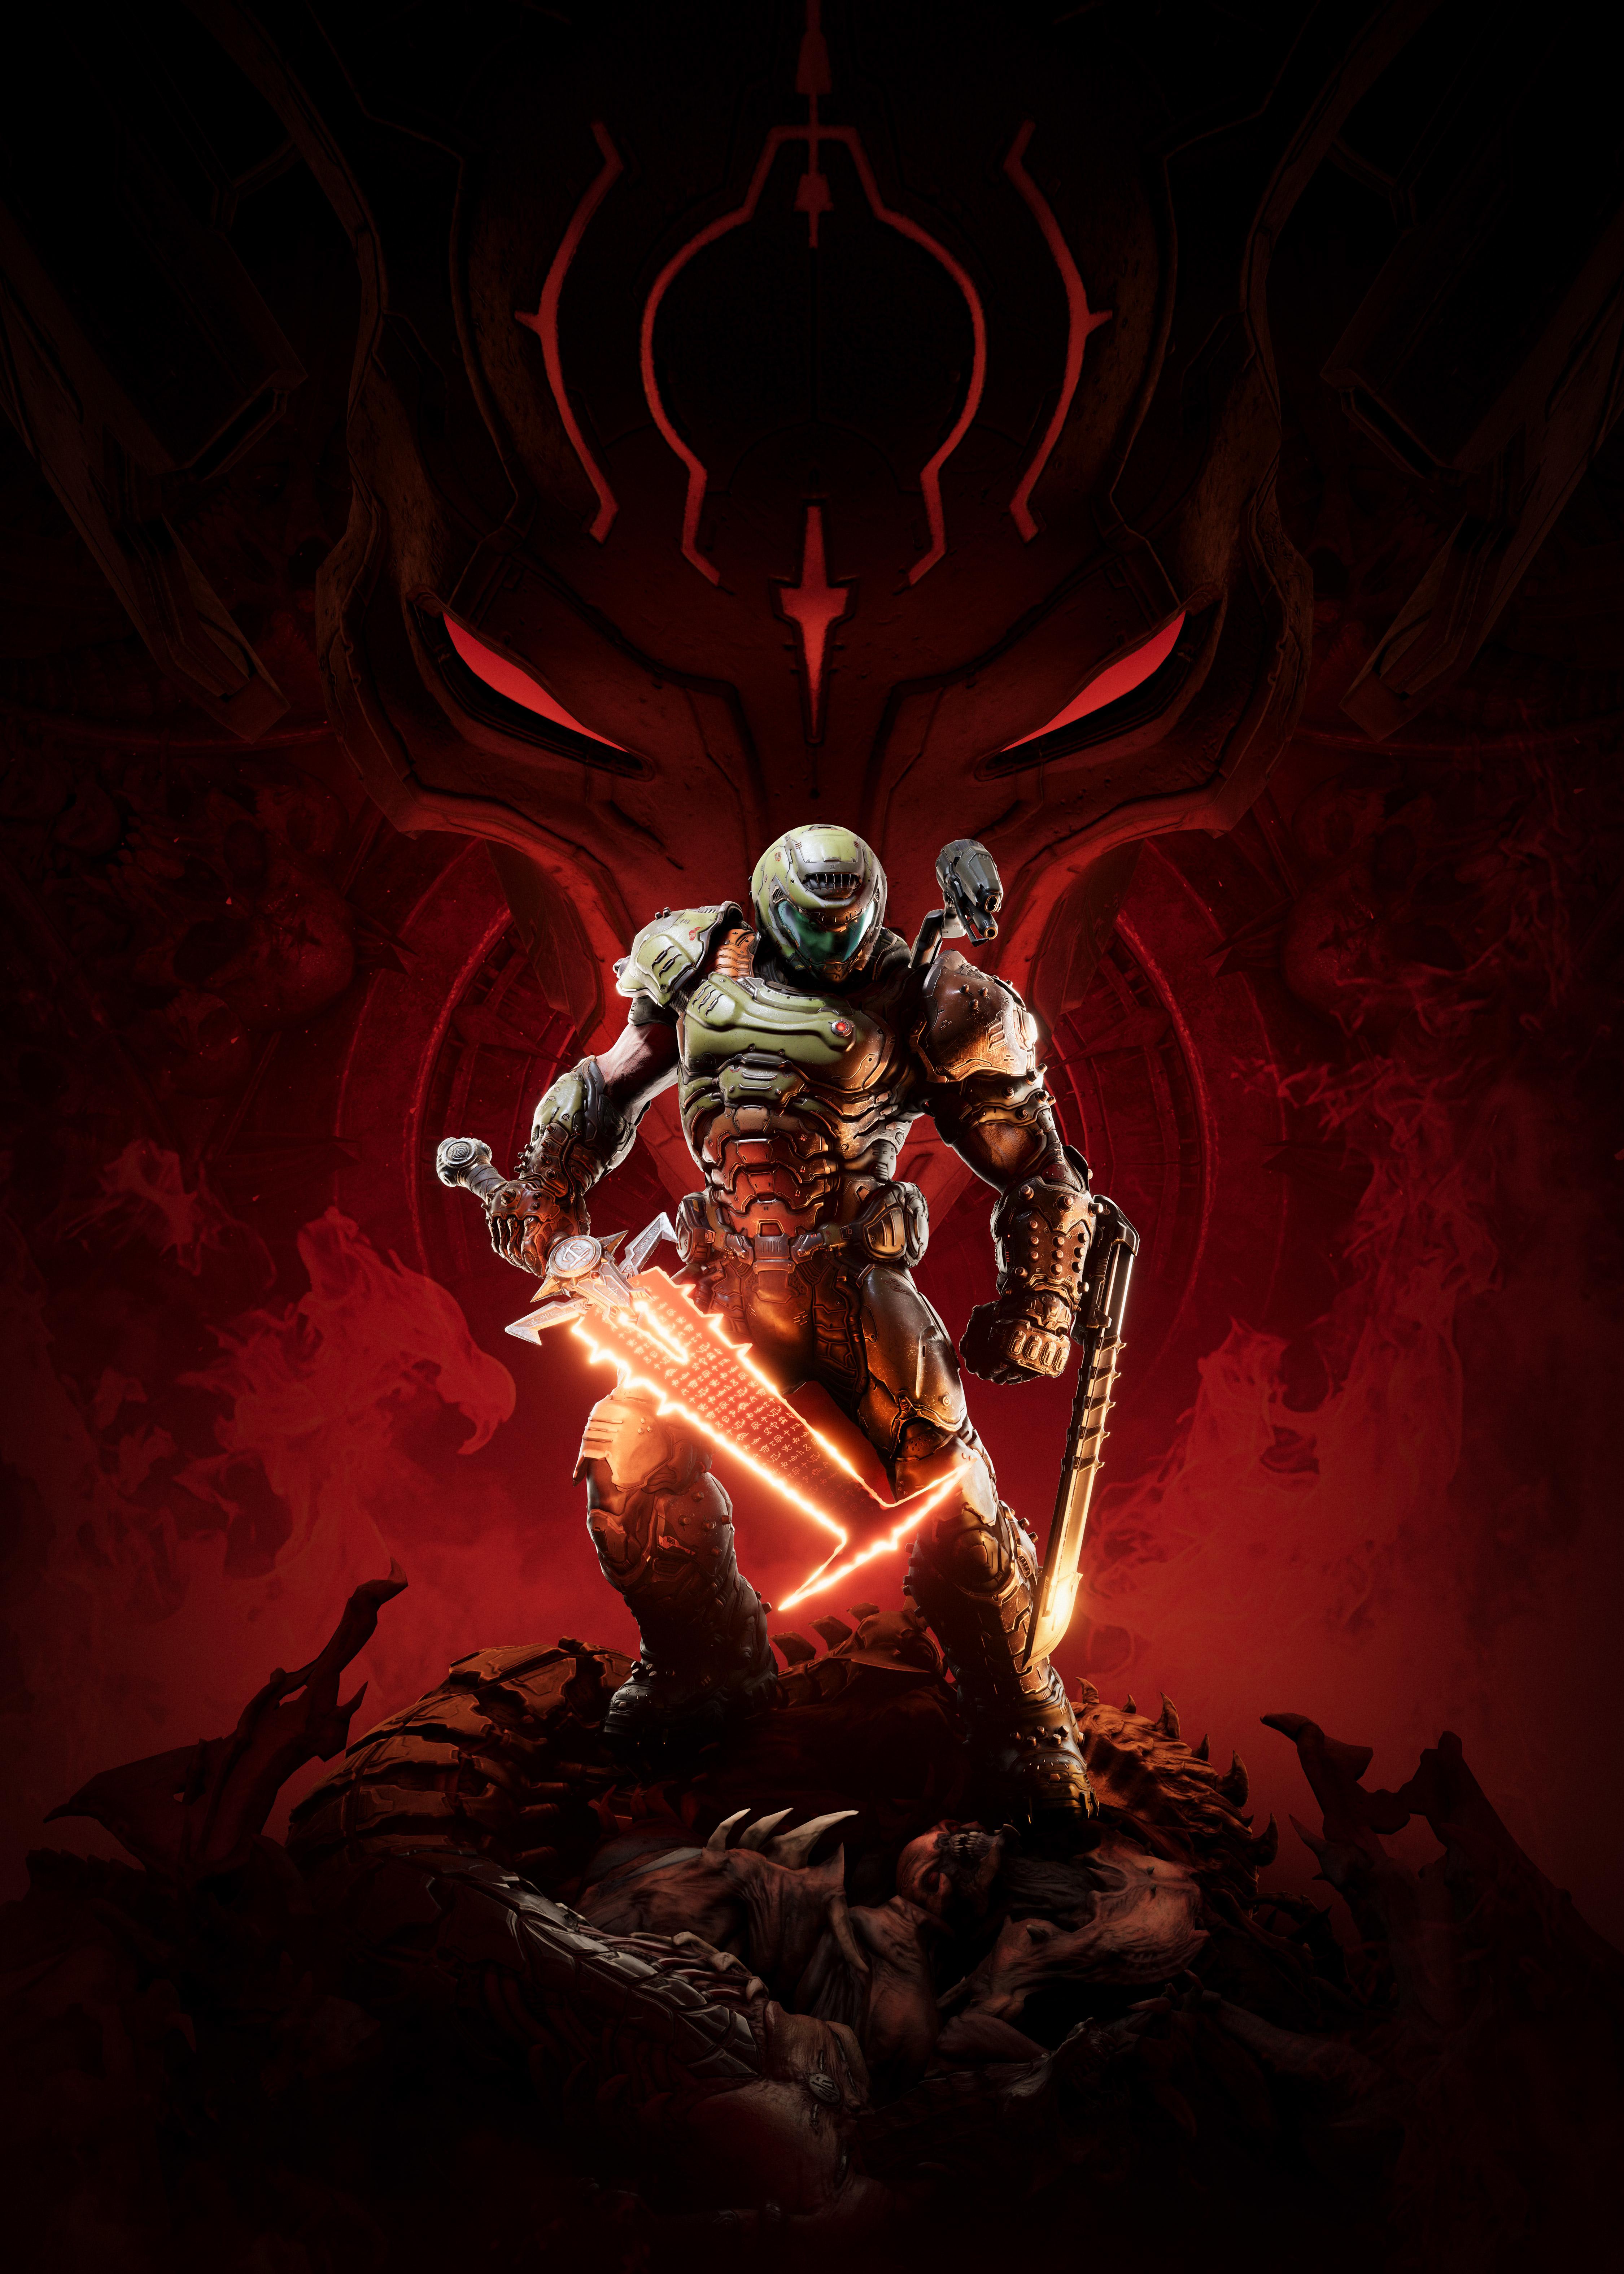 Doom Eternal Game 2020 Wallpaper, HD Games 4K Wallpapers ...